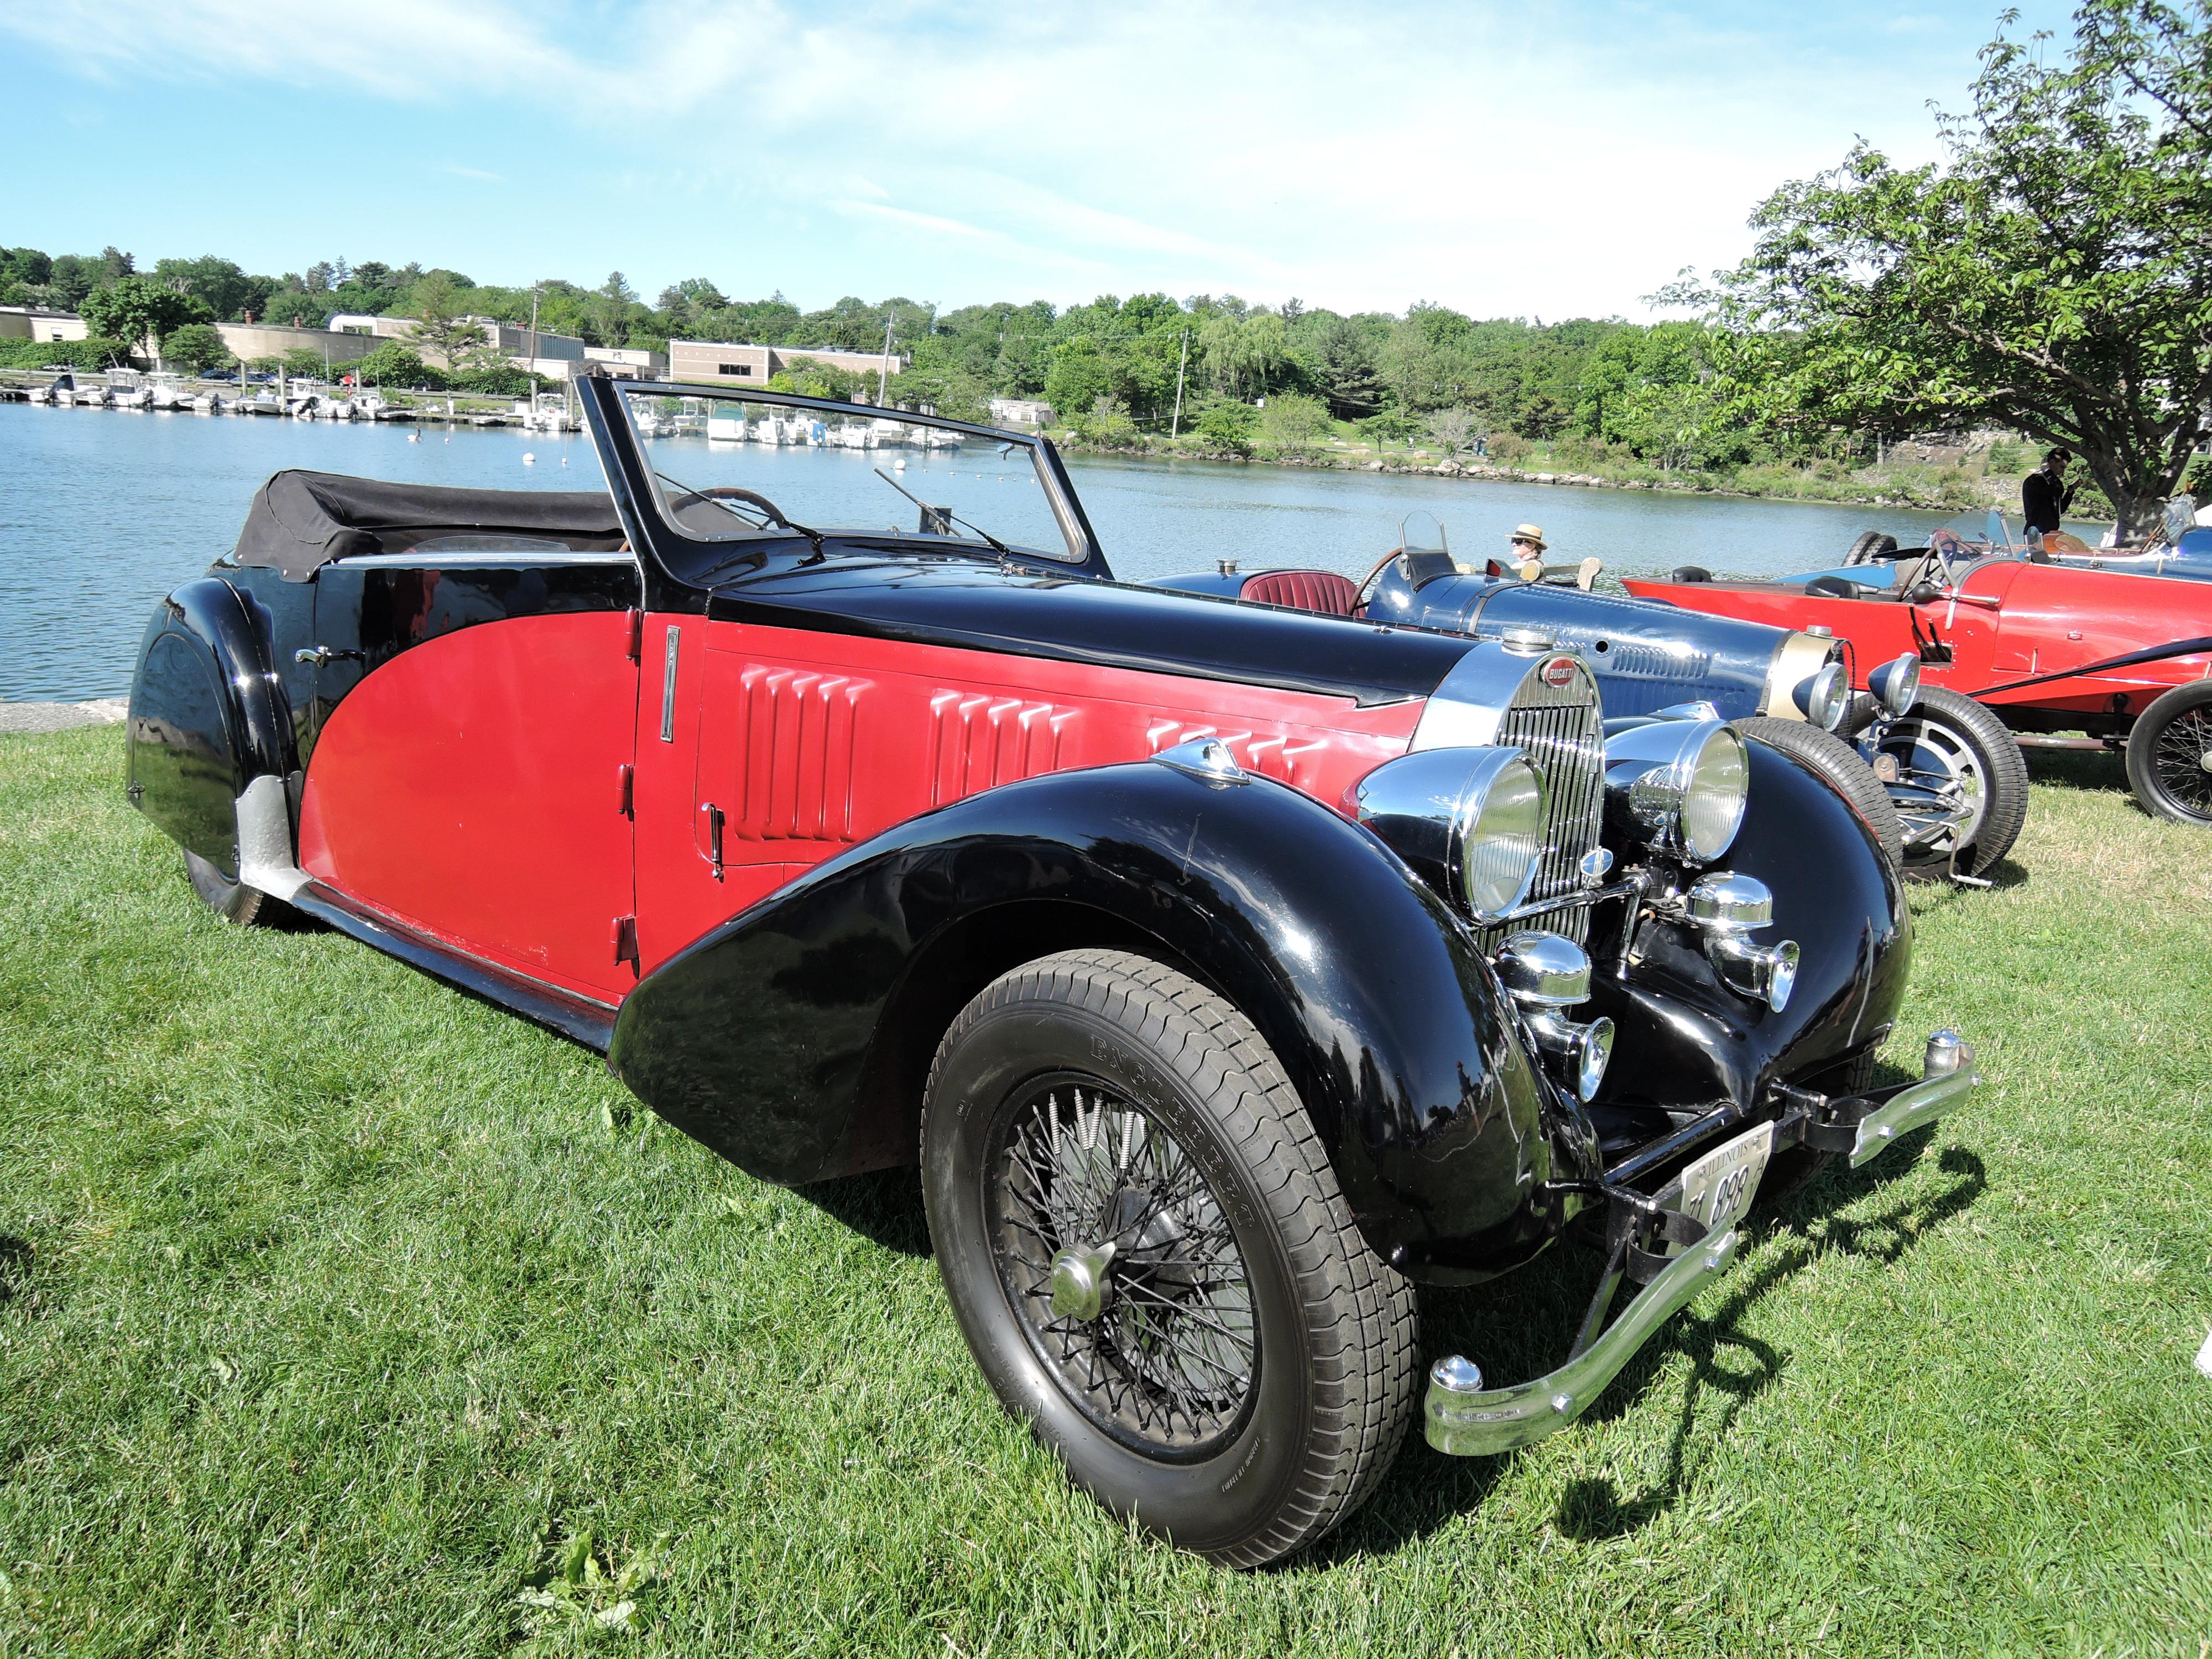 red/black 1937 Bugatti Type 57 Stelvio - Greenwich Concours d'Elegance 2017